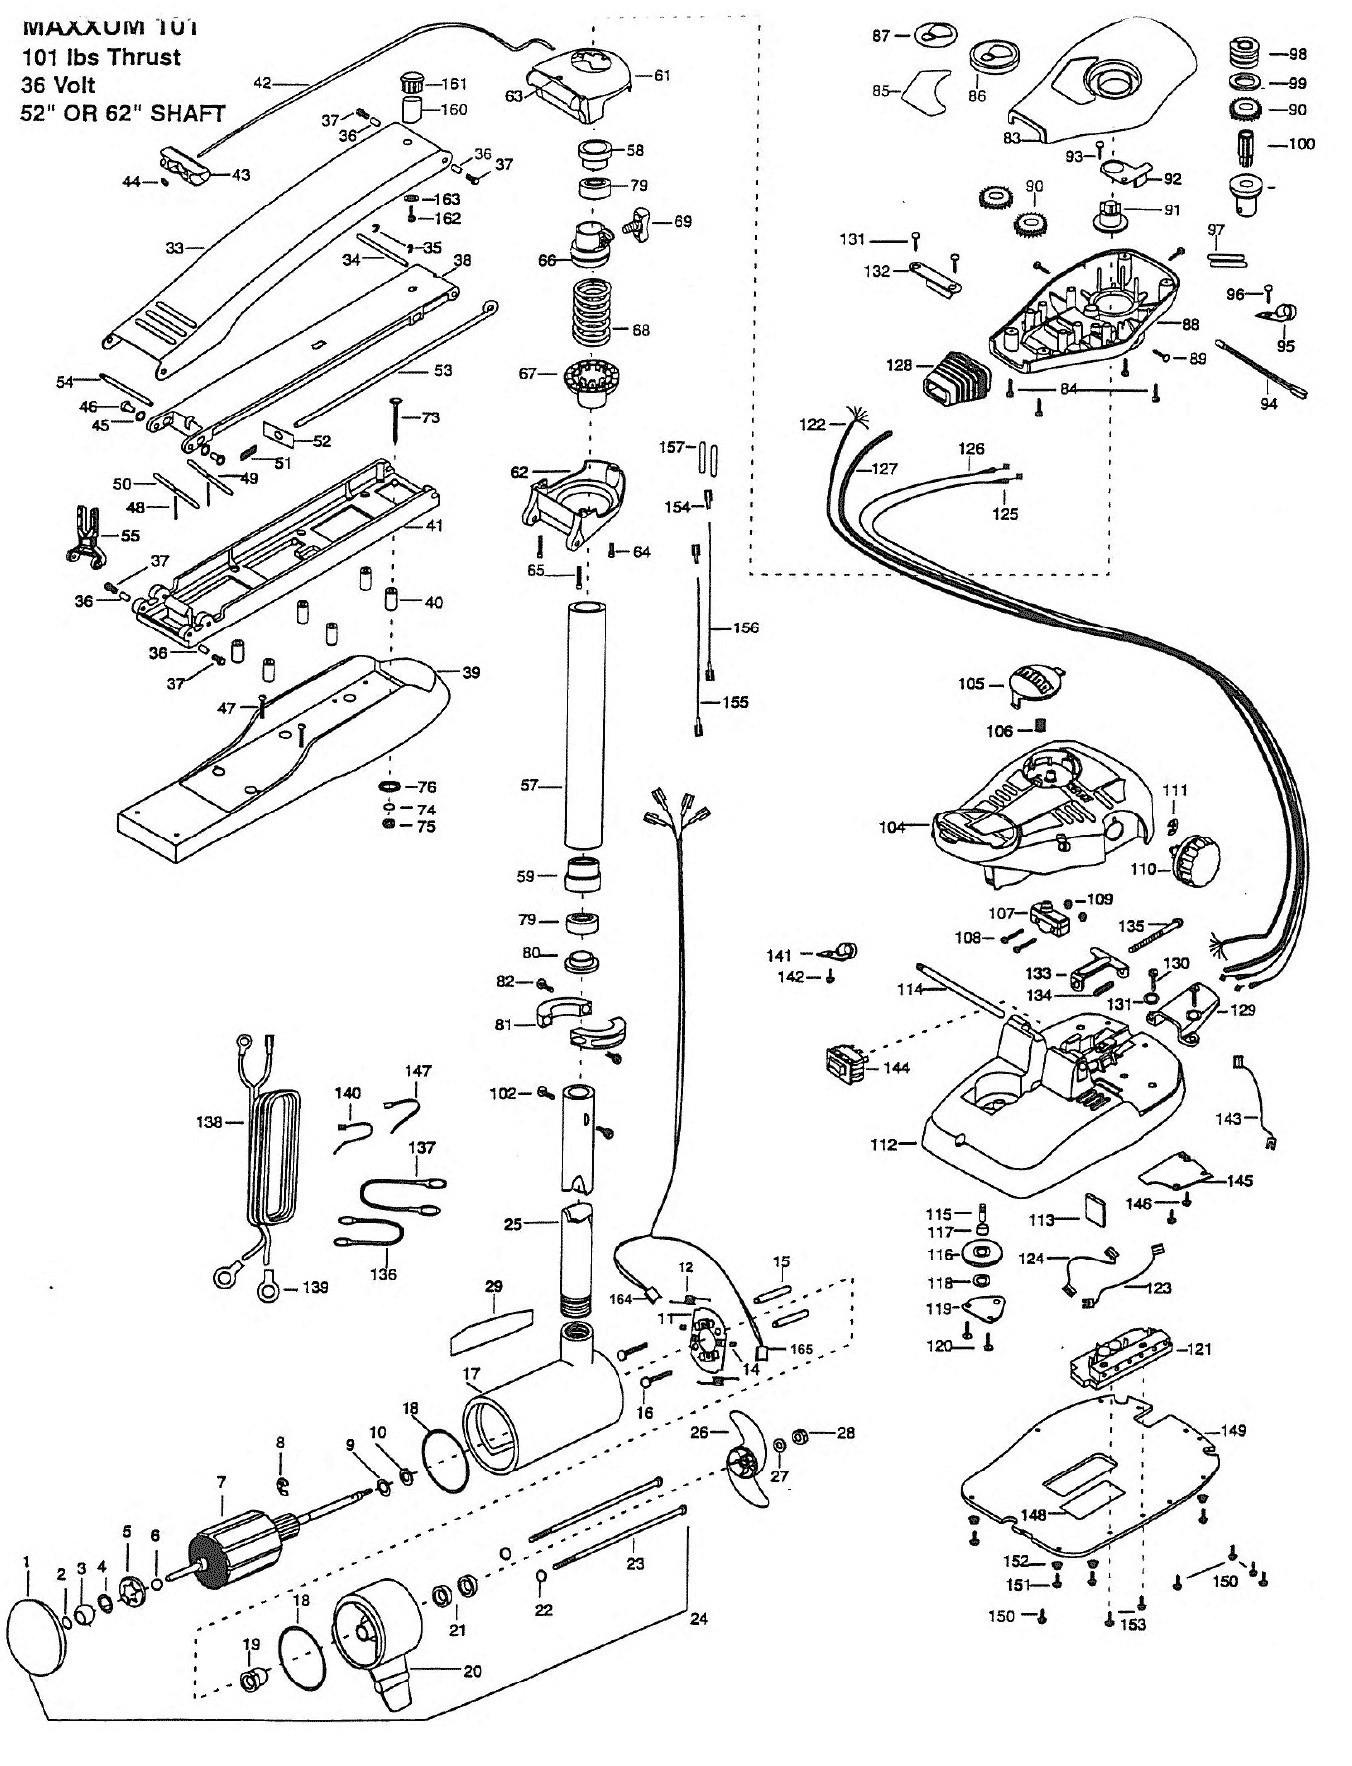 24v terrova trolling motor wiring diagram